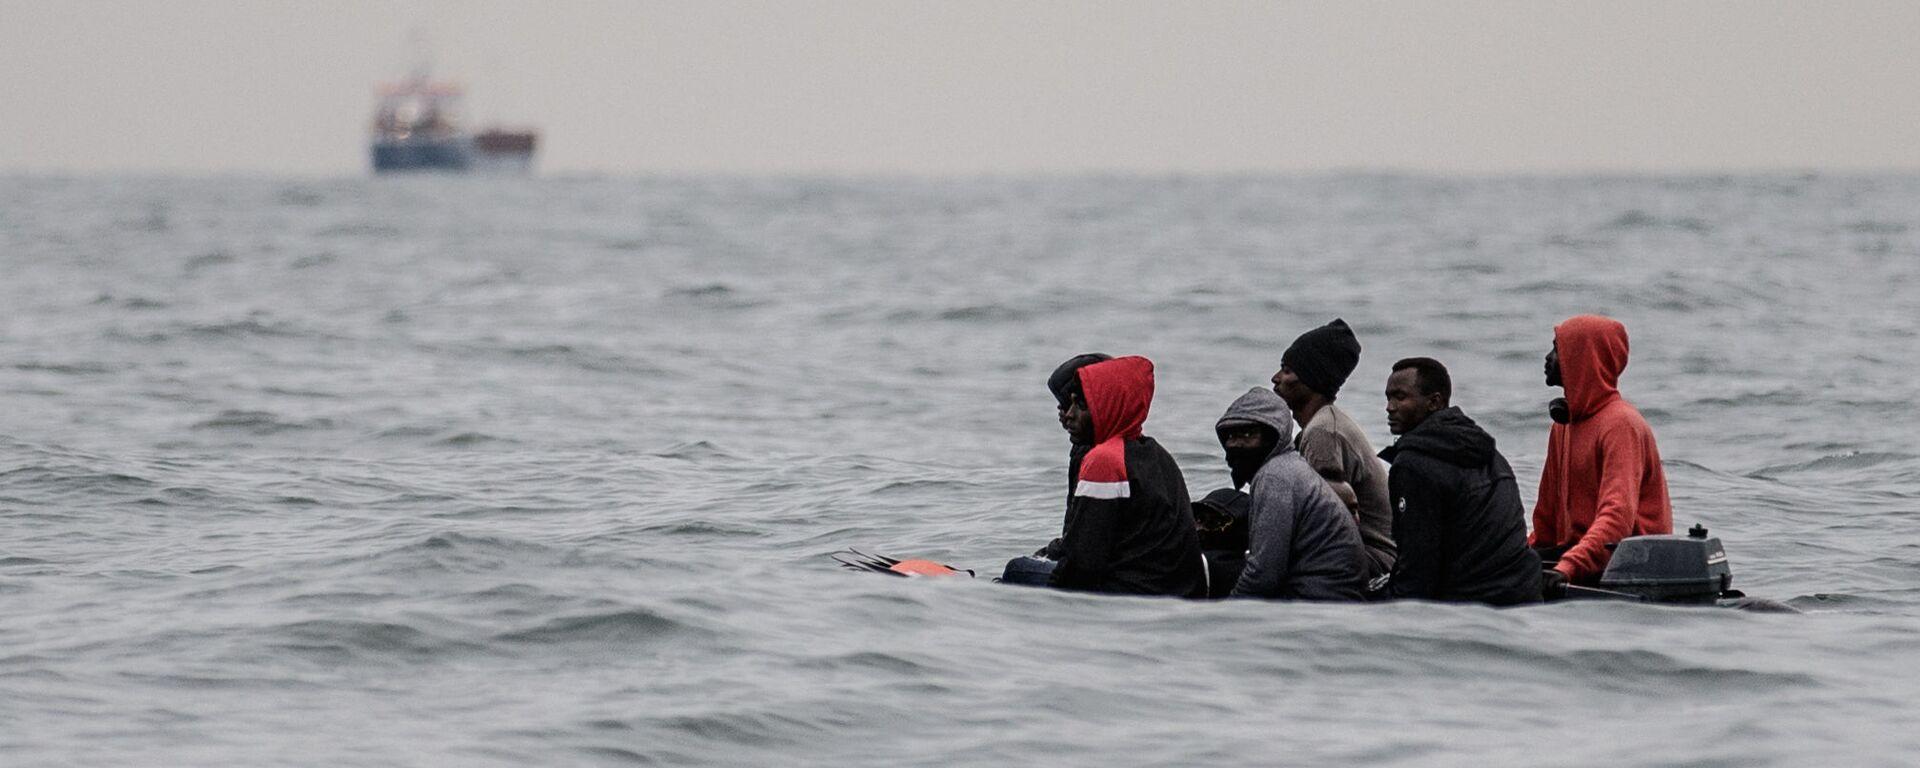 Migranti attraversano la Manica - Sputnik Italia, 1920, 03.09.2021